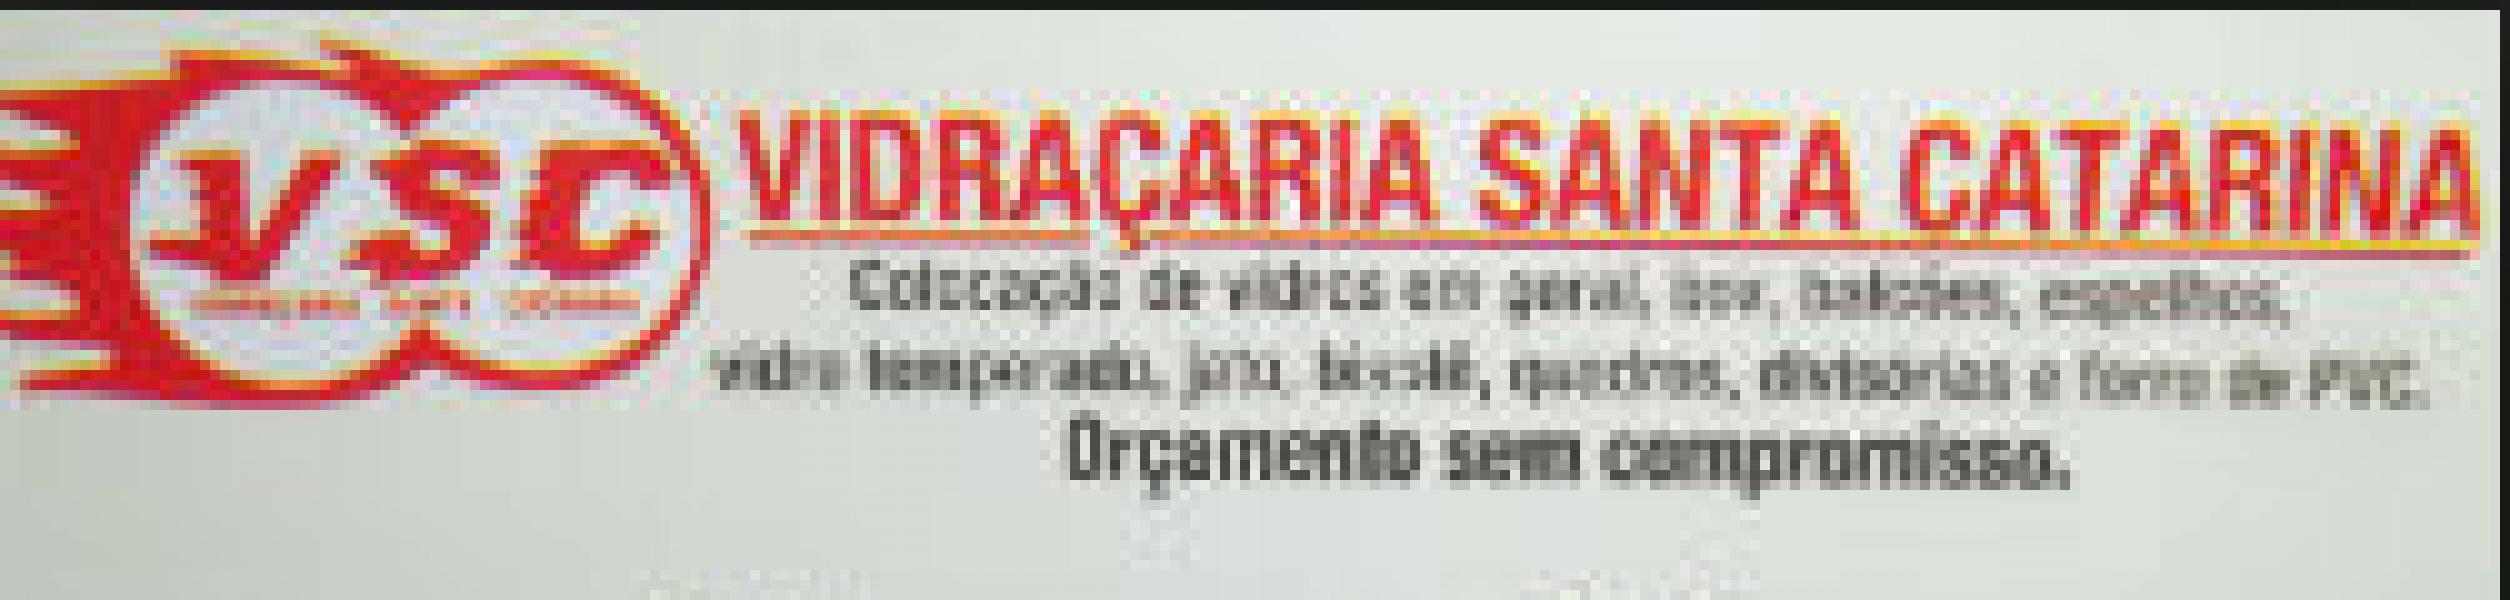 Vidraçaria Santa Catarina